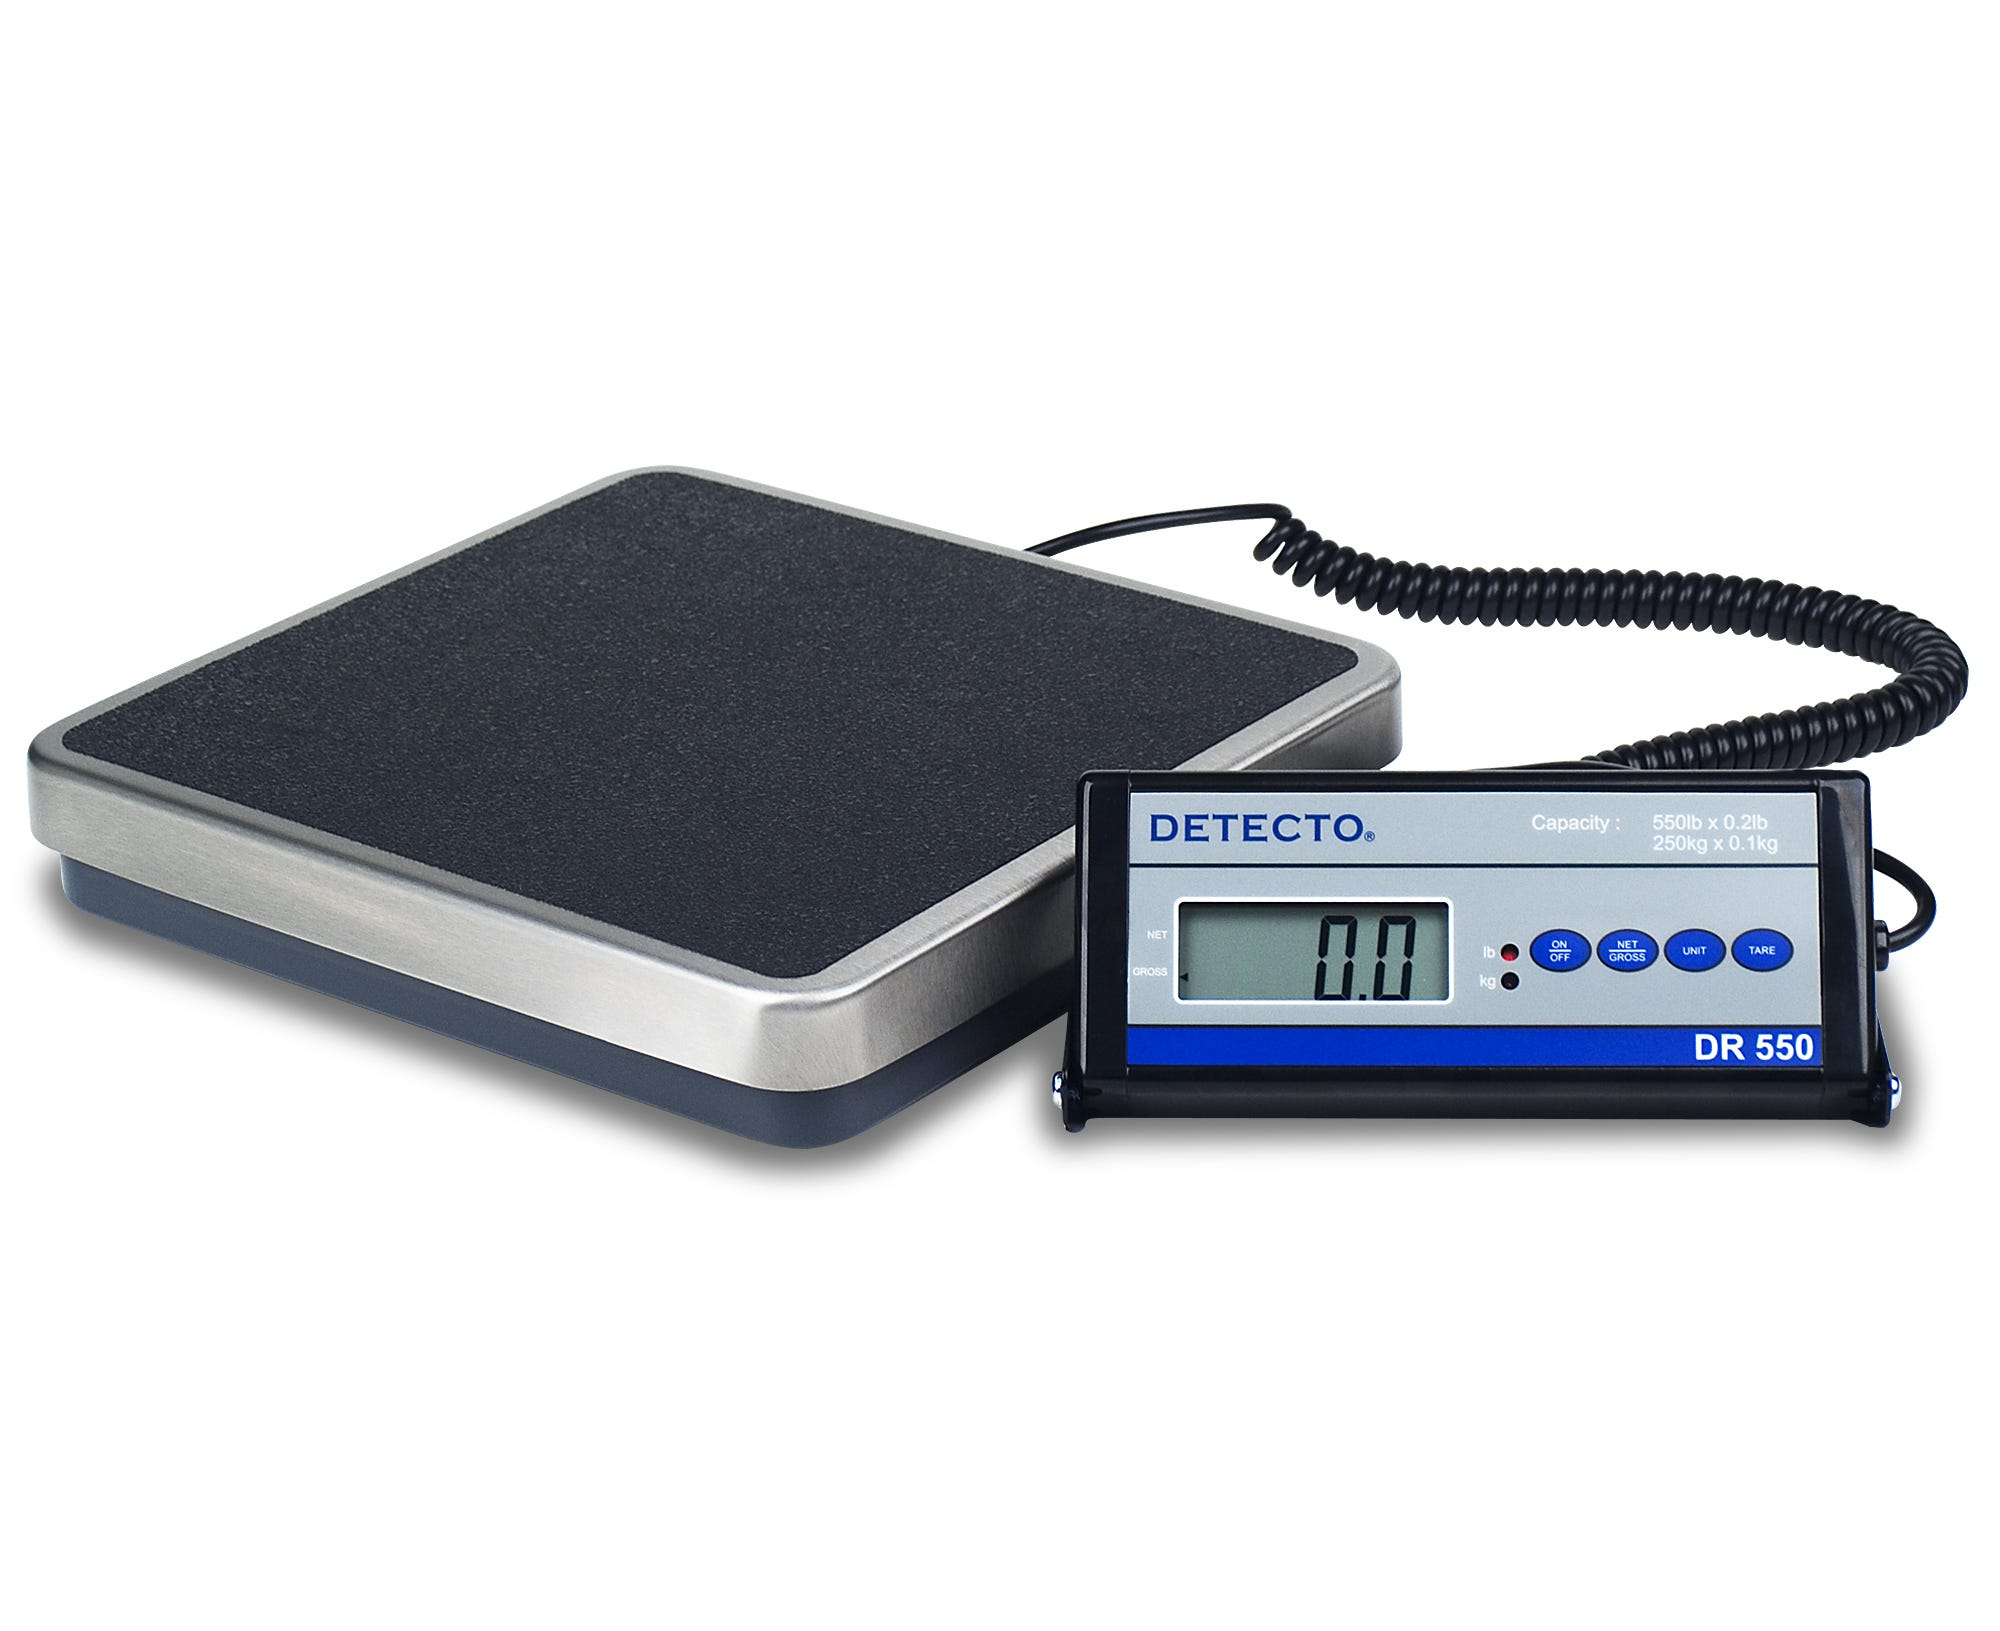 Detecto Dr400c Portable General Purpose Scale Cme Corp